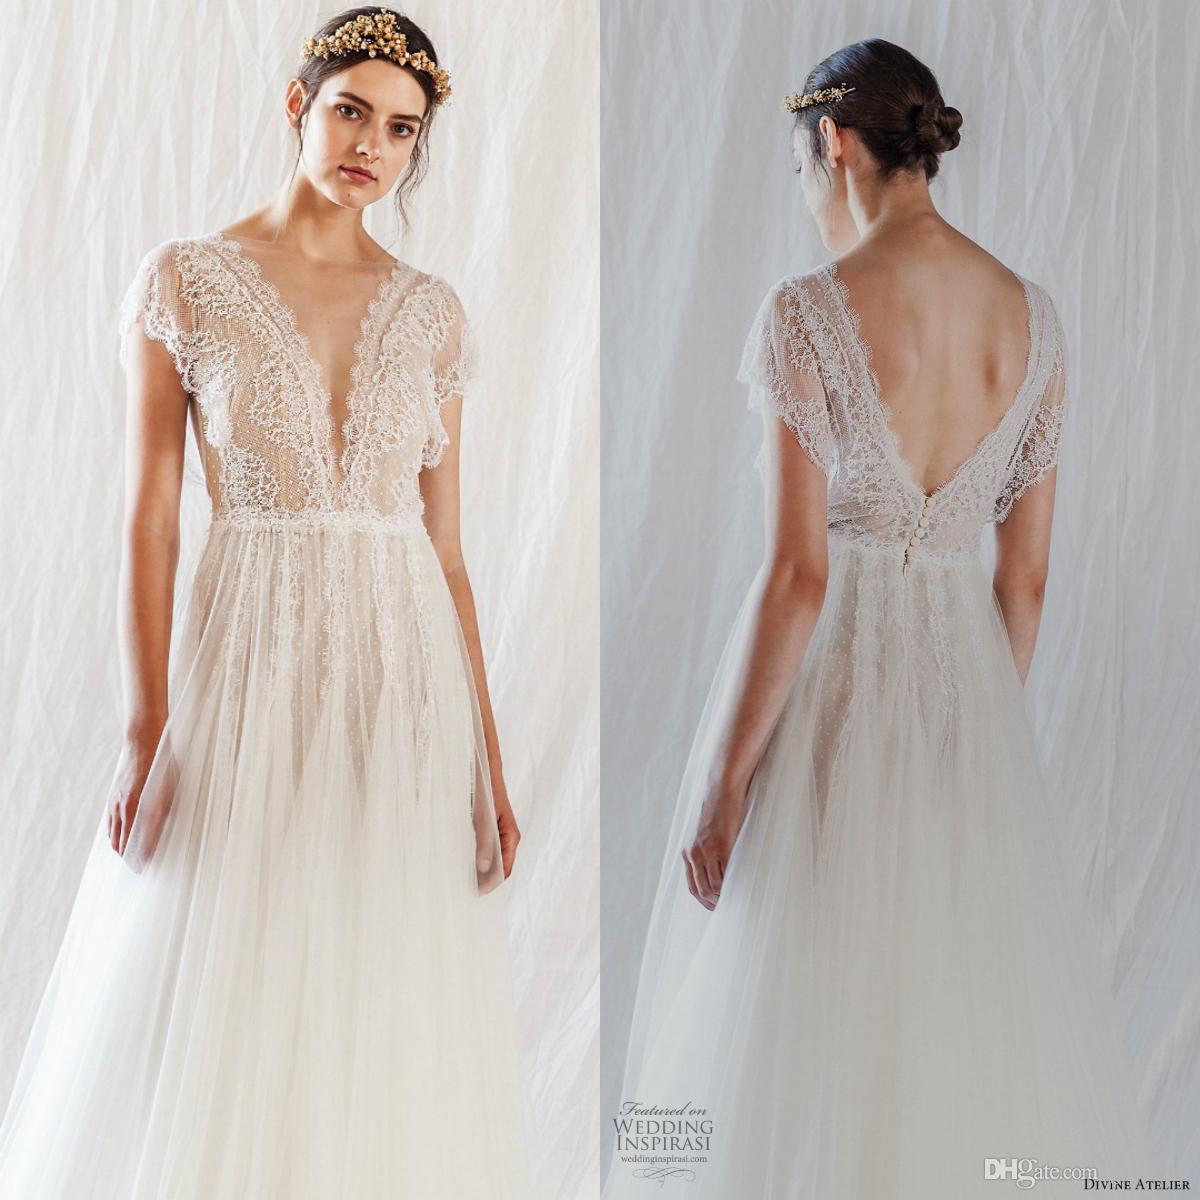 Atelier divino 2019 vestidos de noiva bohemia lace v neck cap manga backless praia boho vestidos de noiva plus size robe de mariée